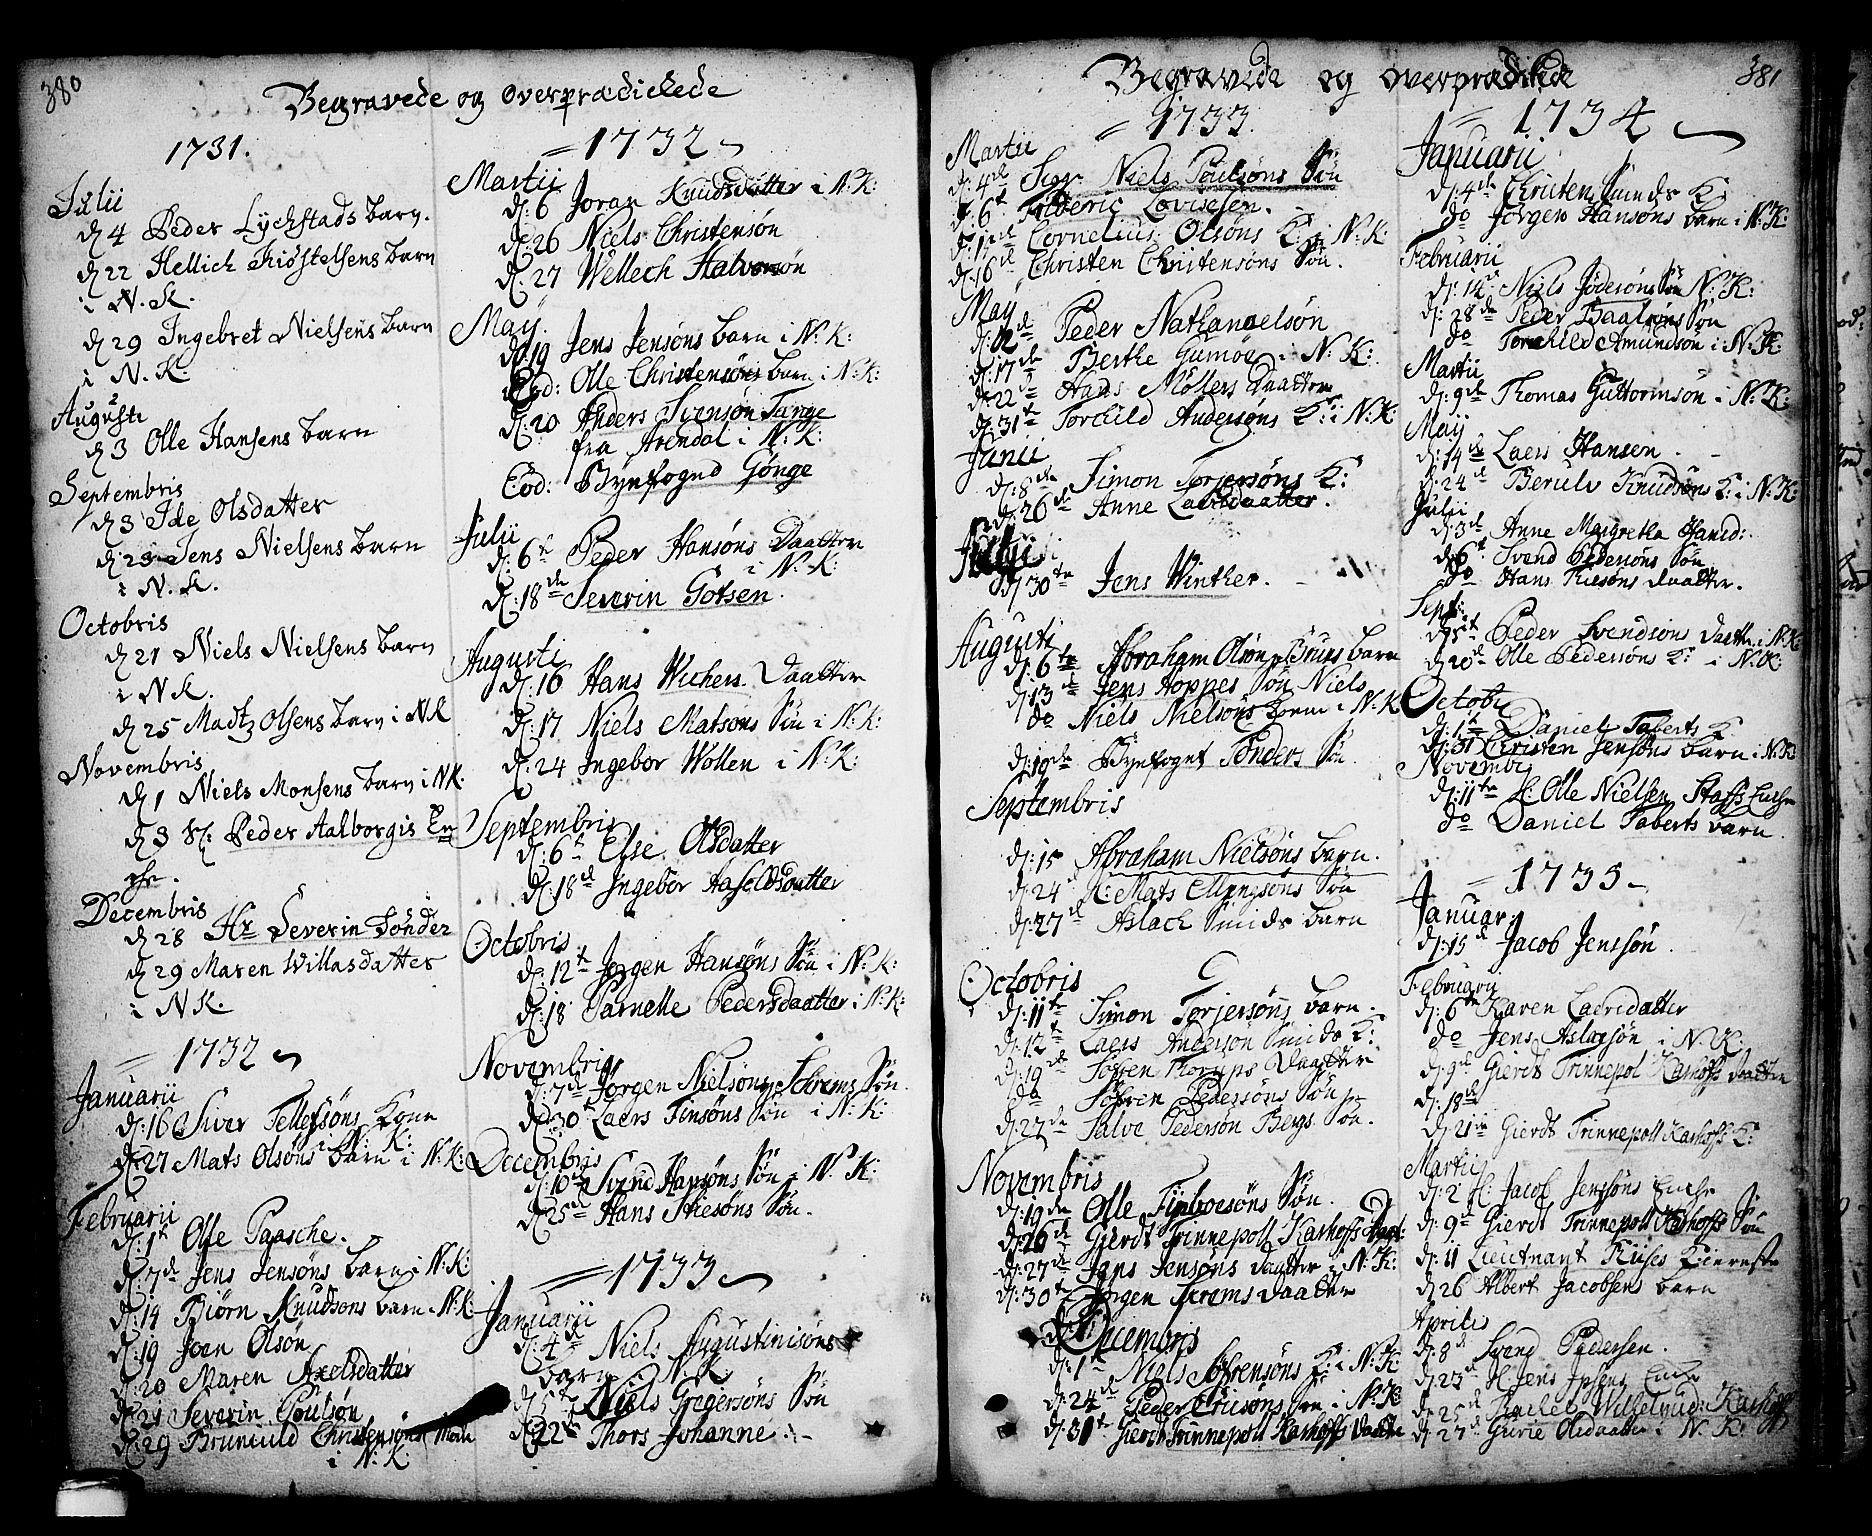 SAKO, Kragerø kirkebøker, F/Fa/L0001: Ministerialbok nr. 1, 1702-1766, s. 380-381